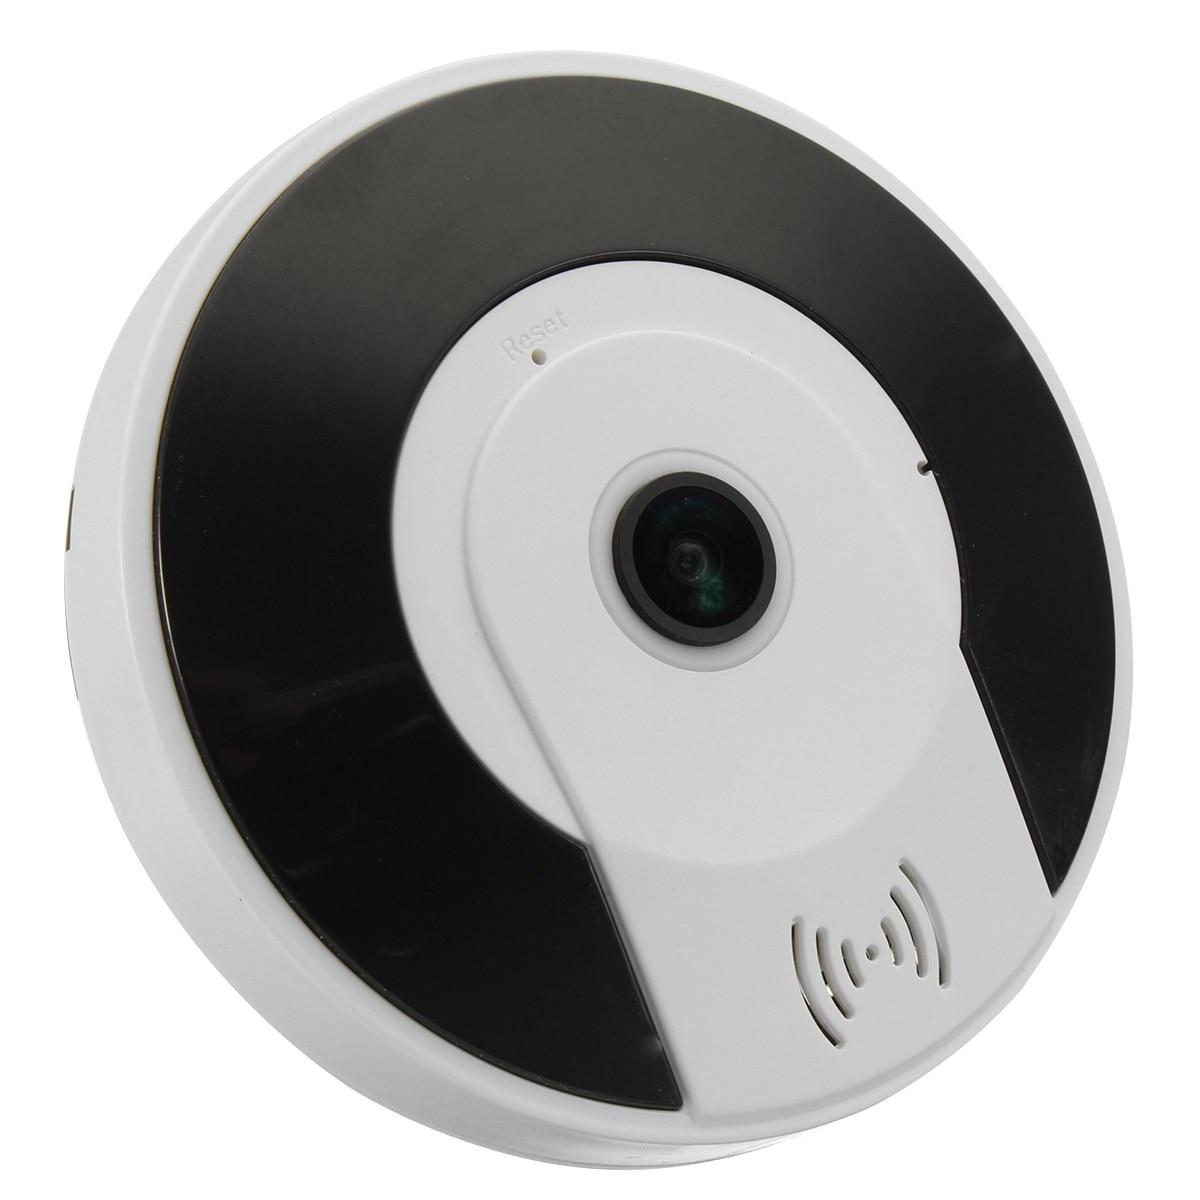 NEW Mini 360 degree 960P  Wireless HD Fisheye IP Camera Two Way Night Vision Wifi Panoramic Home Security Safety 1 3mp hd wifi camera ip 360 degree panoramic fisheye lens ip camera wifi wireless two way audio night vision wifi ip camera